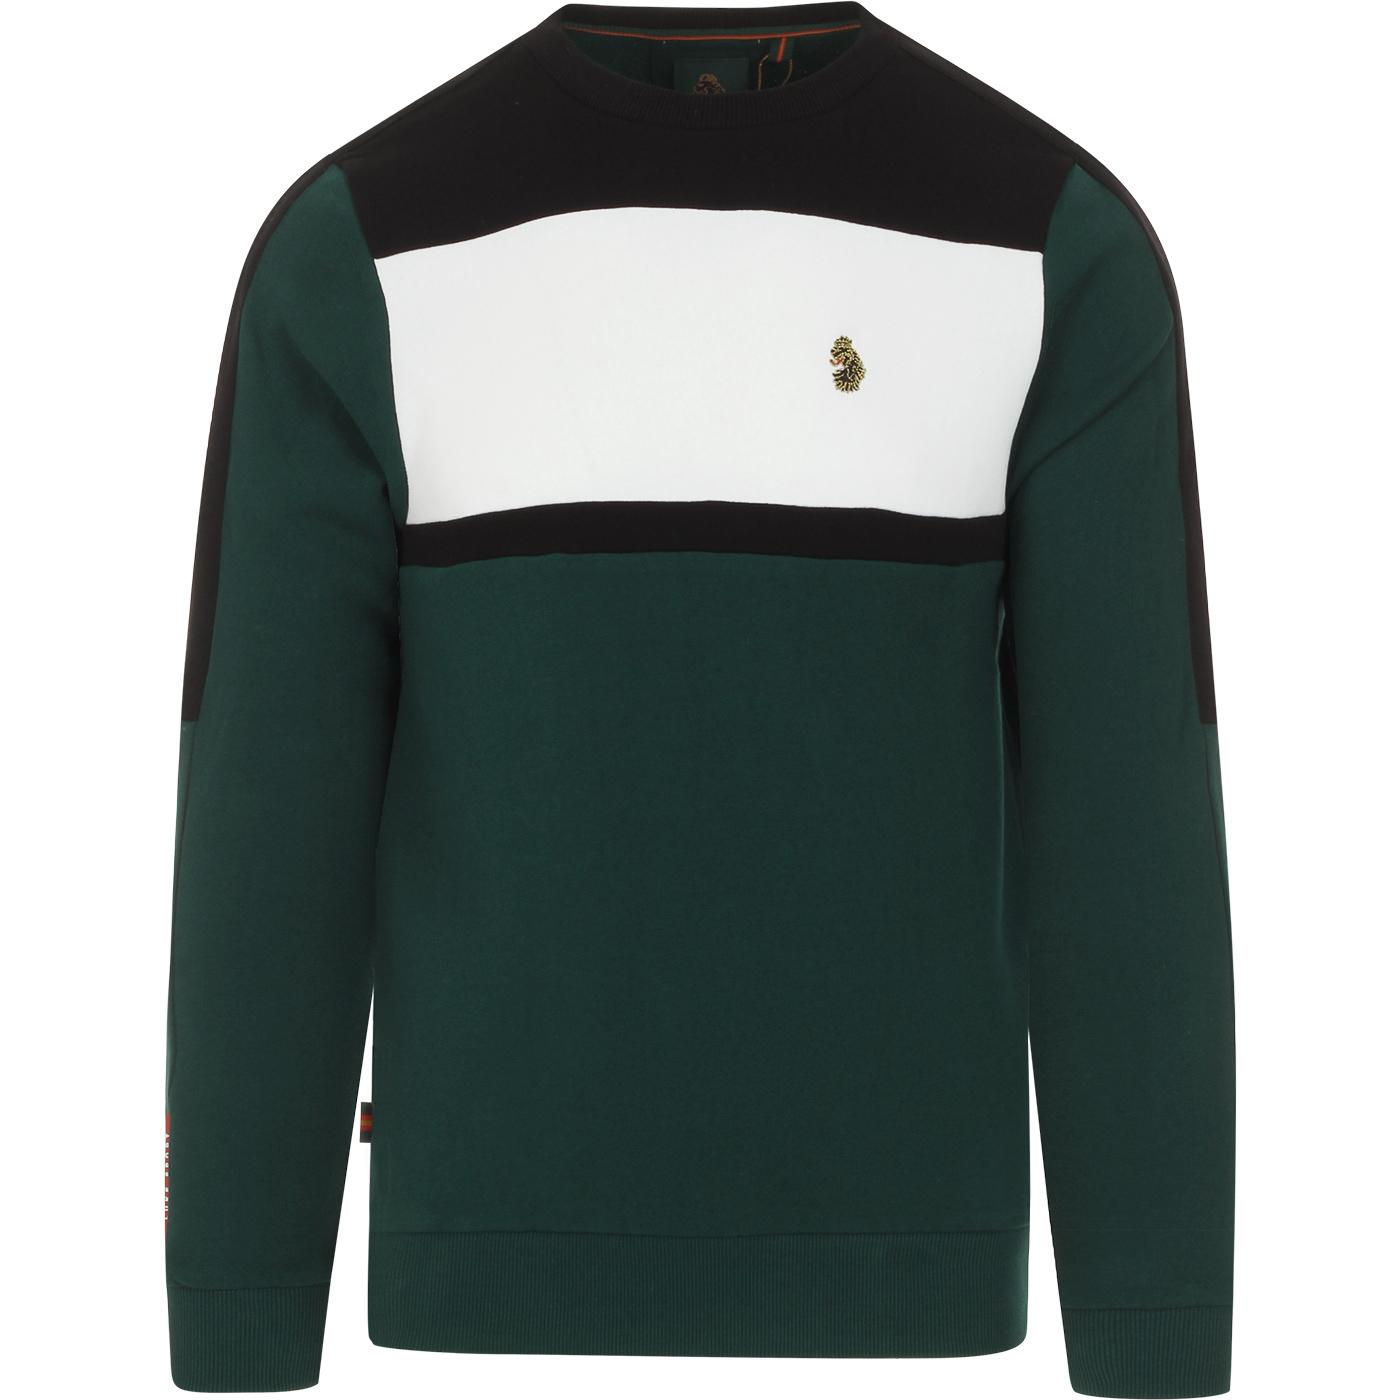 Badsey LUKE Retro 90s Colour Block Sweatshirt (EG)